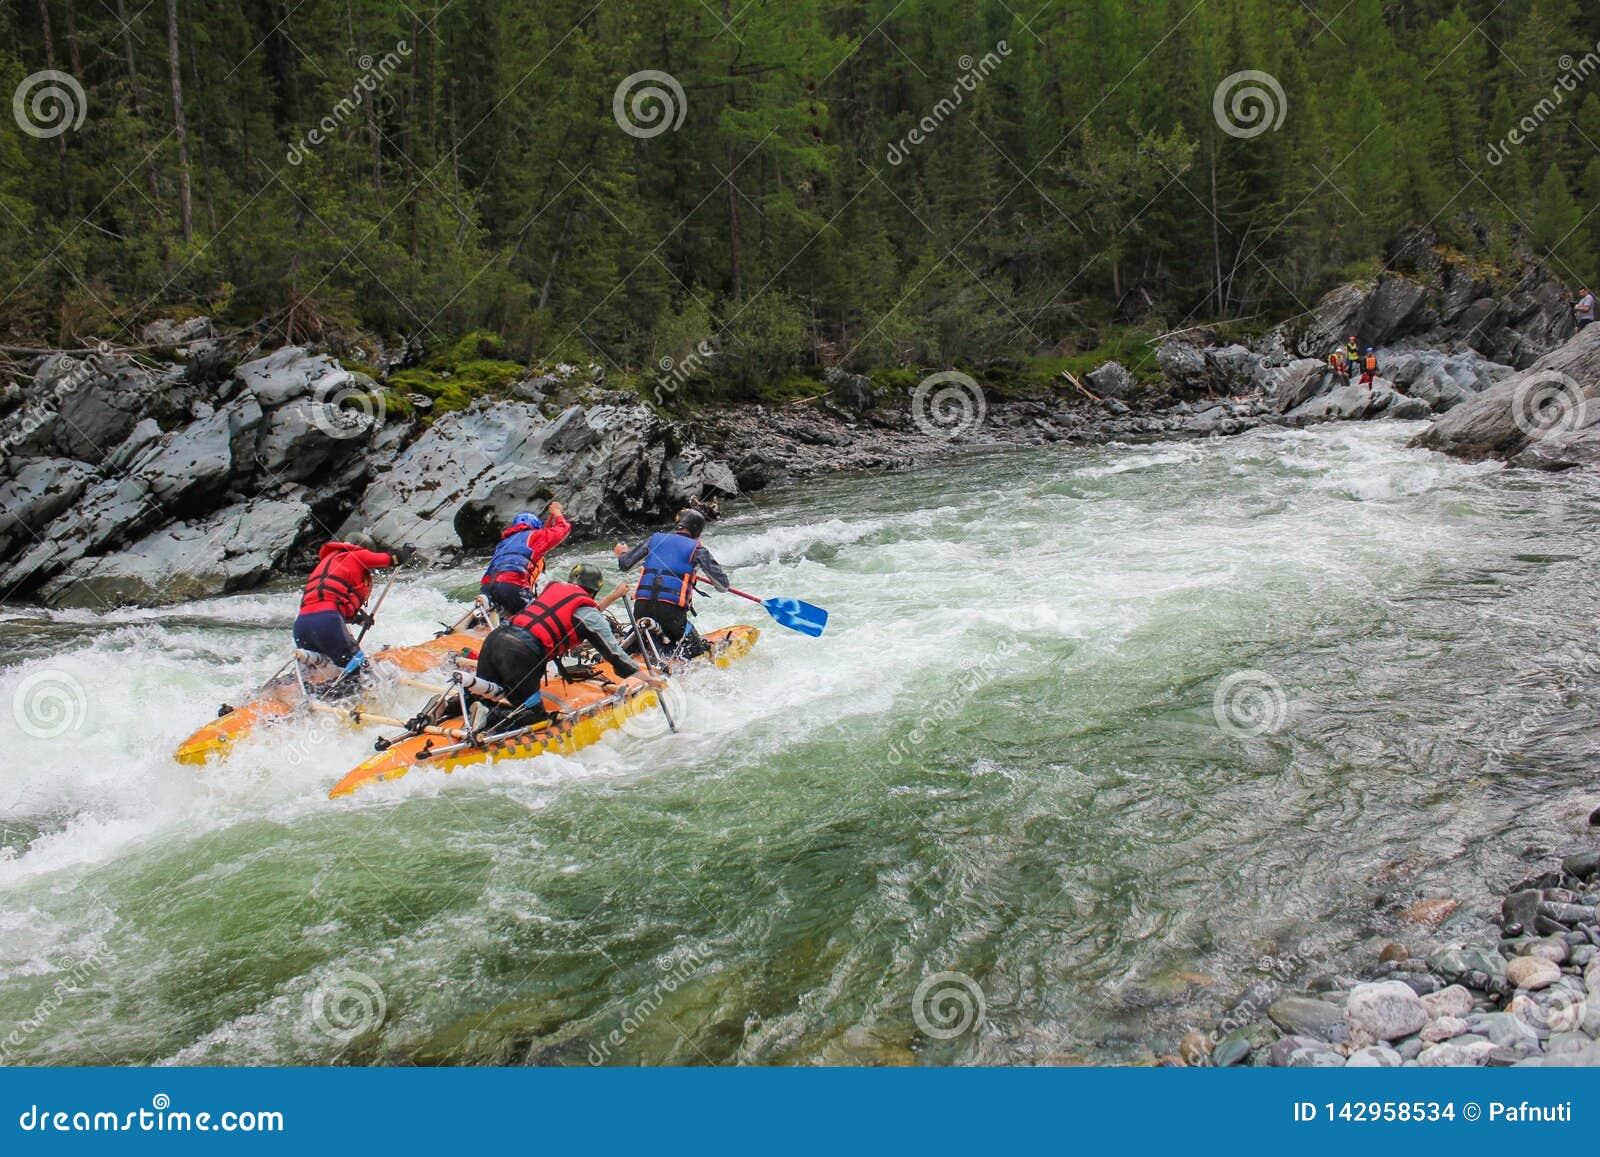 Extreme sportsmen go through the difficult turbine rapid on a catamaran